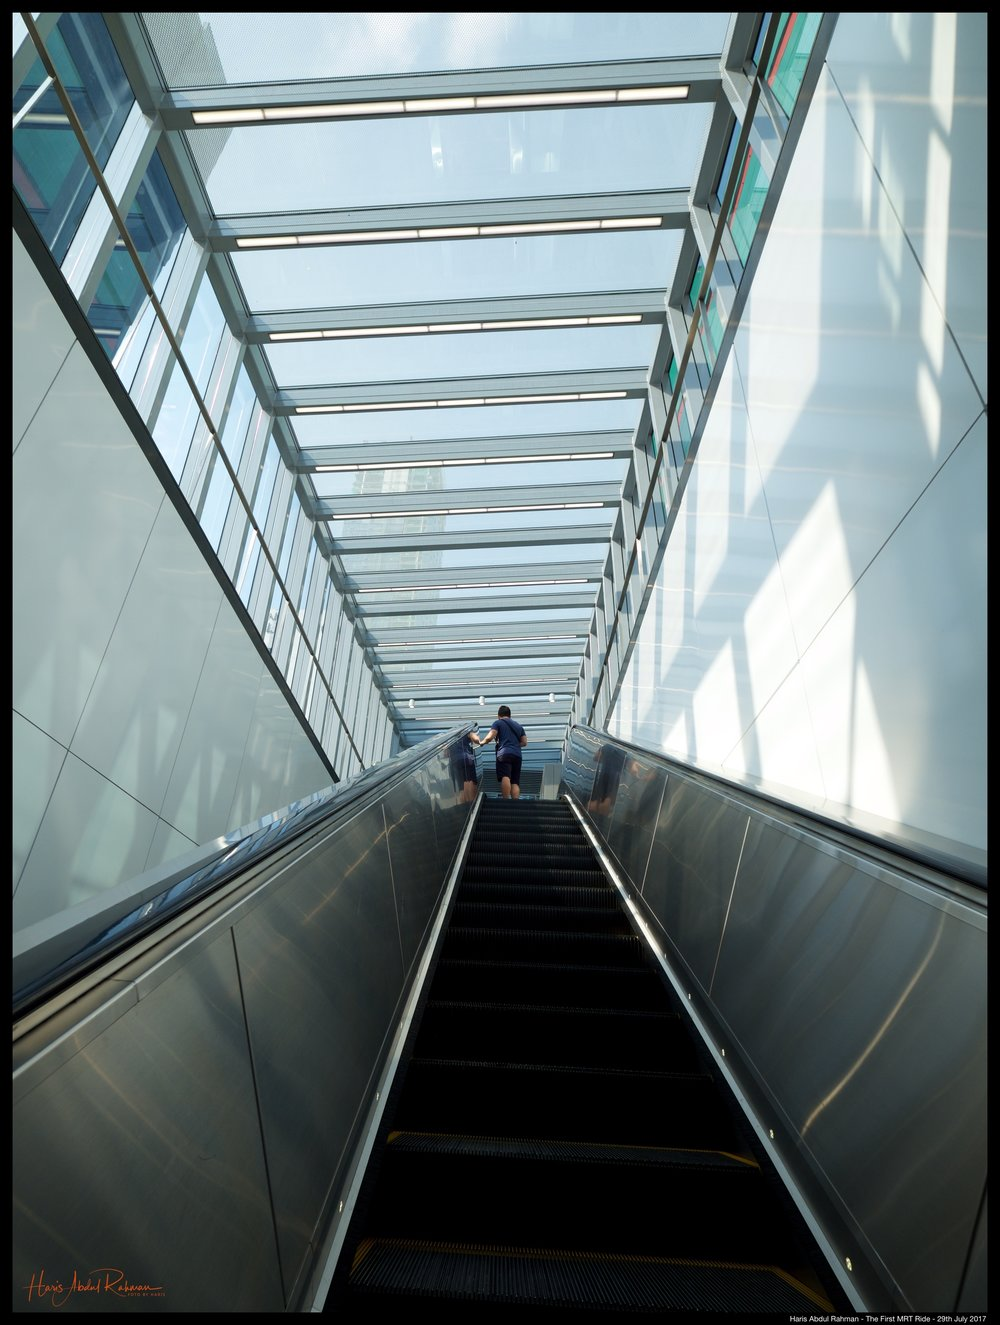 Finally reaching Bukit Bintang. Another escalator up ...